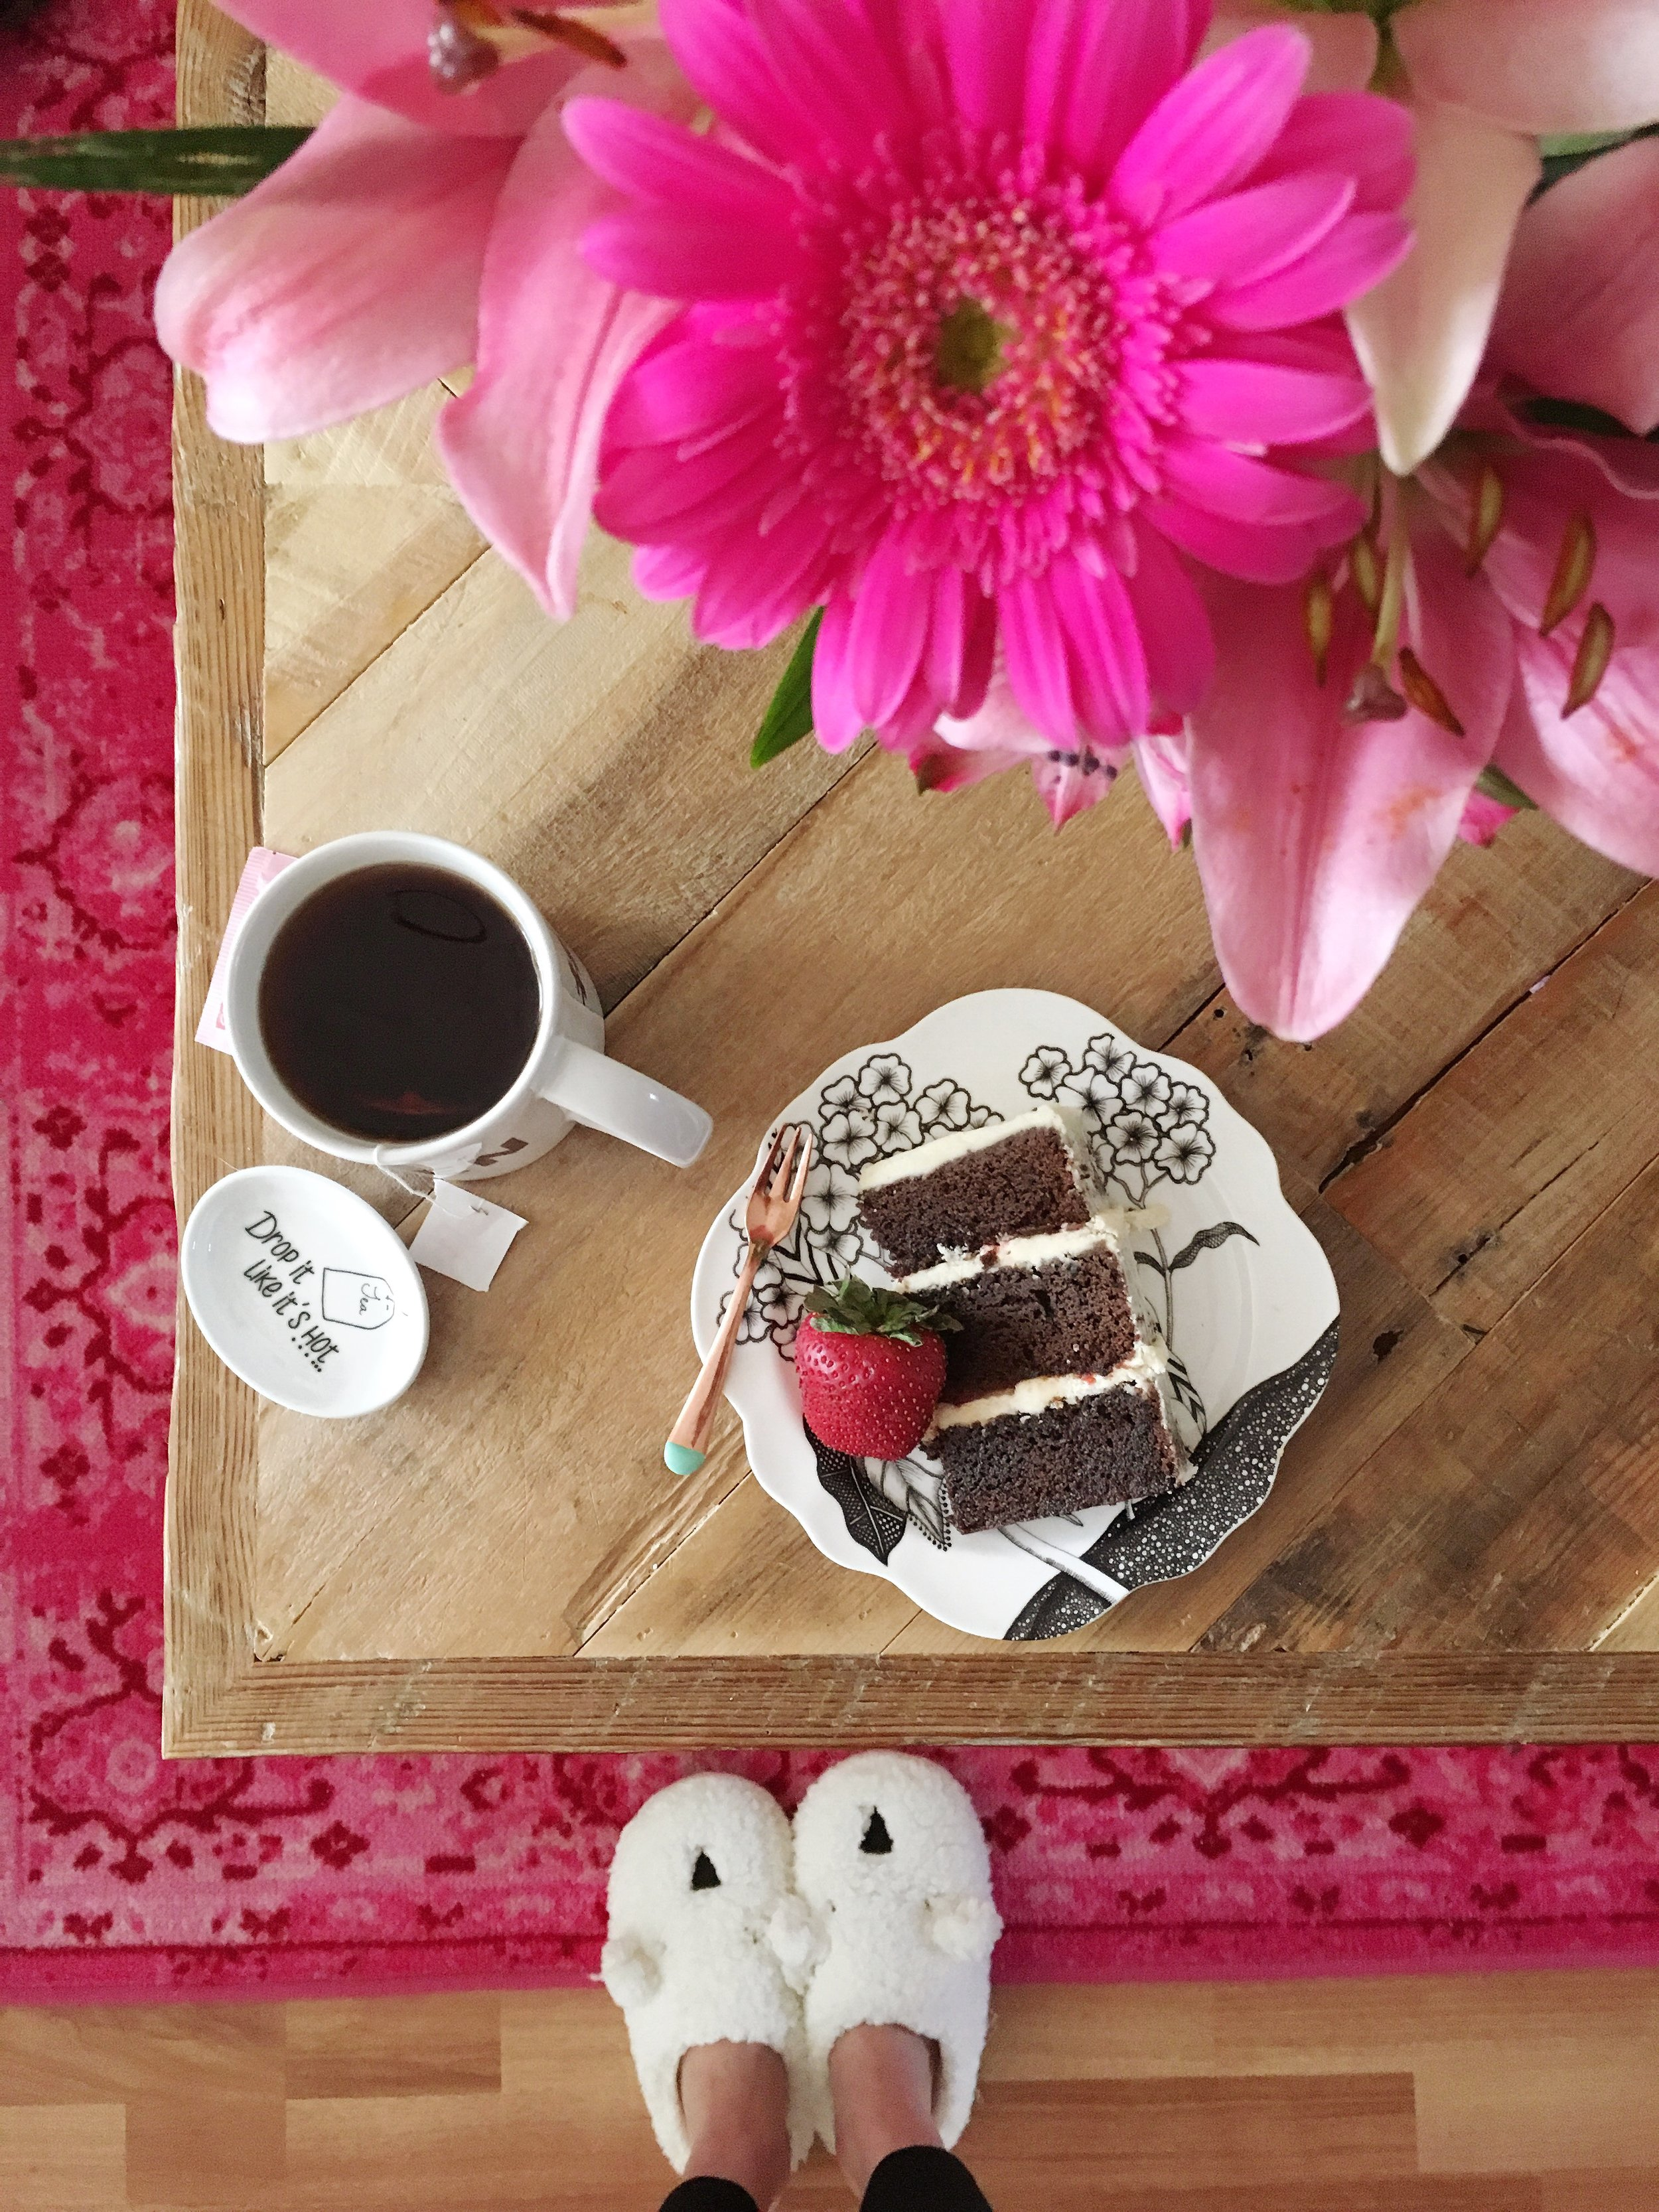 Cake For Breakfast from the Unusually Lovely Blog